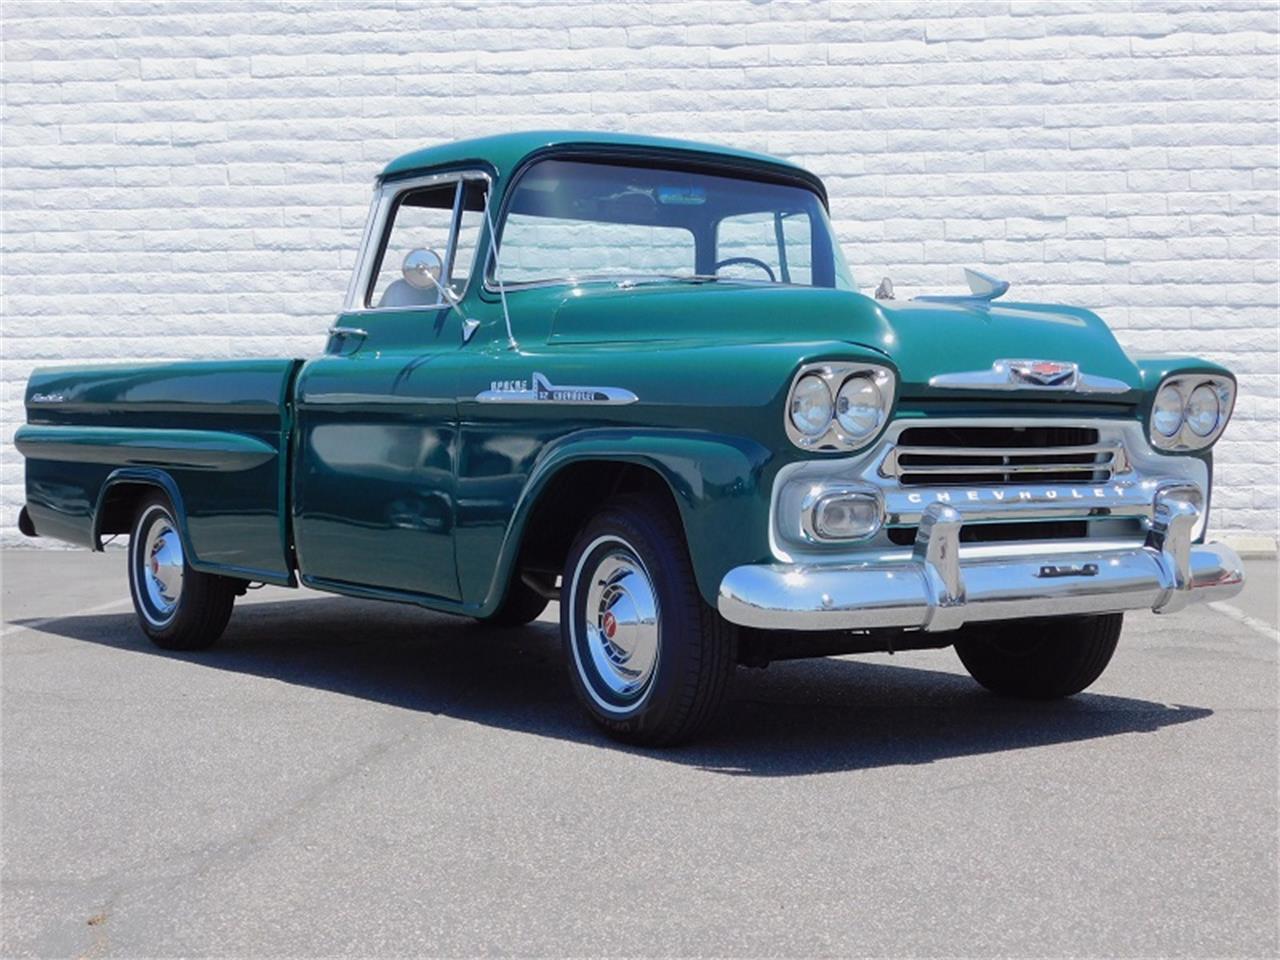 Prime 1958 Chevrolet 3200 For Sale Classiccars Com Cc 1102311 Evergreenethics Interior Chair Design Evergreenethicsorg